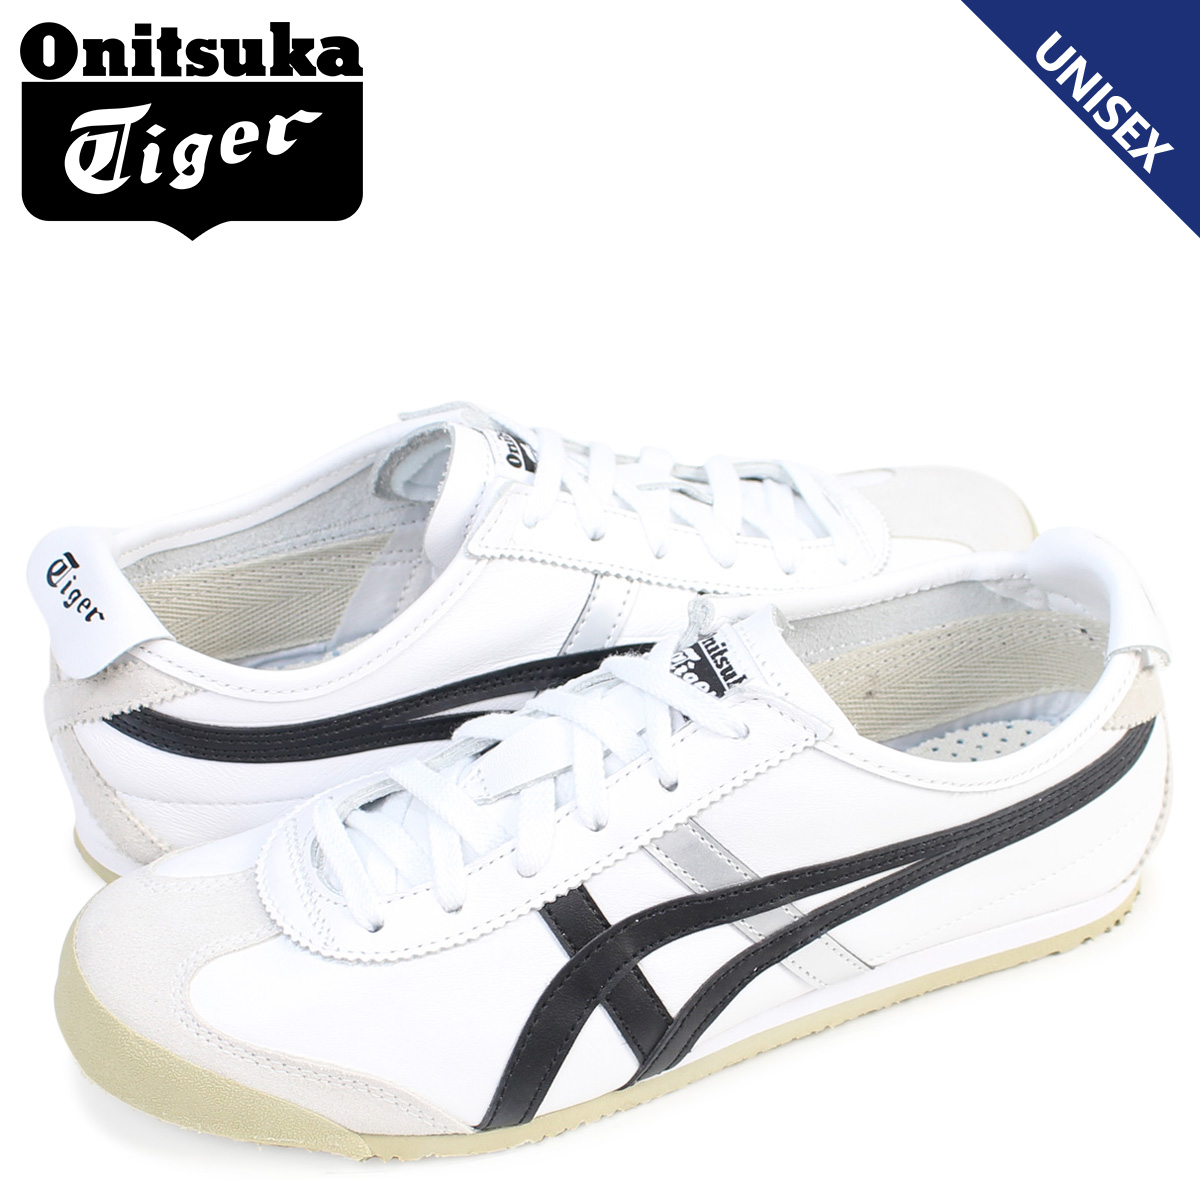 9762a876711b ALLSPORTS  Onitsuka Tiger Mexico 66 Onitsuka tiger MEXICO 66 men s lady s  sneakers asics ASICS DL408-0190 shoes white  8 2 Shinnyu load   178